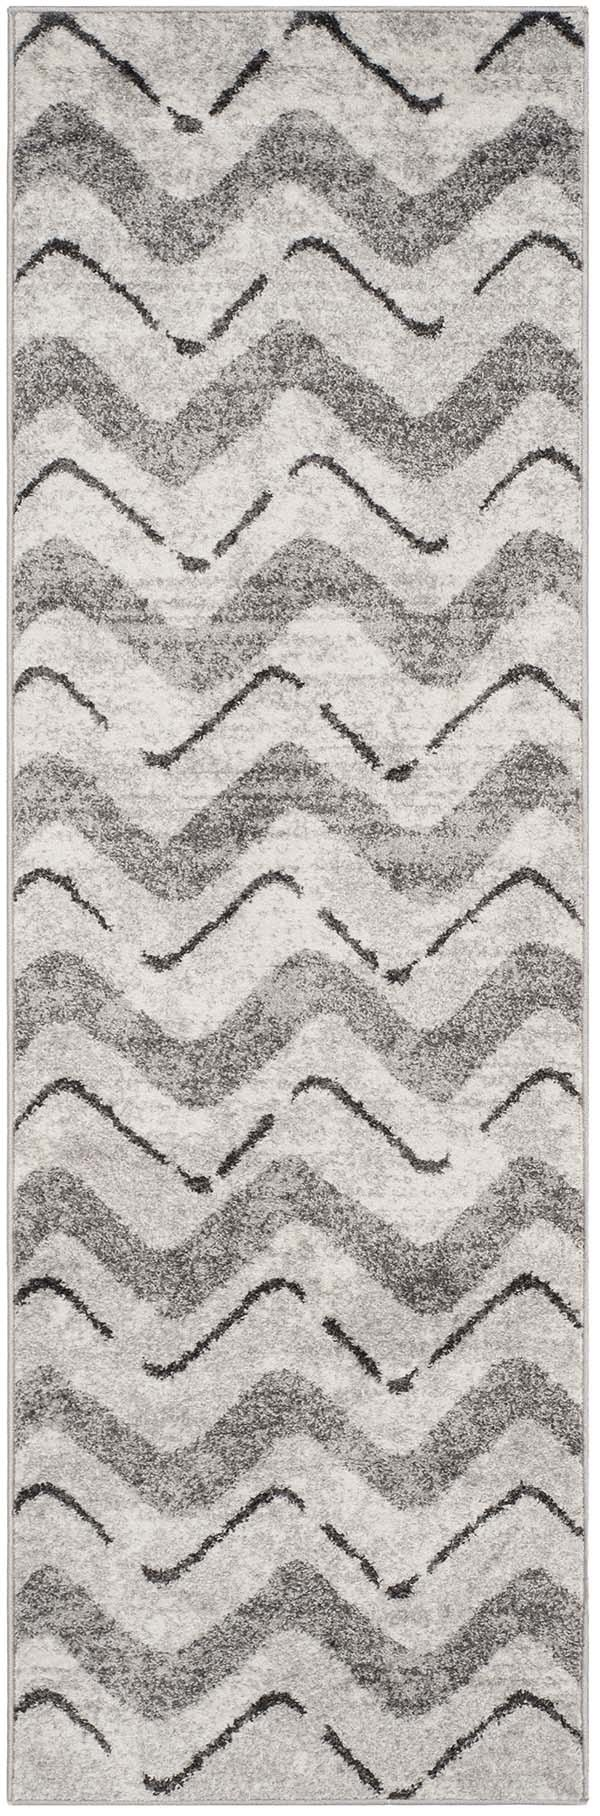 Silver, Charcoal (P) Chevron Area Rug